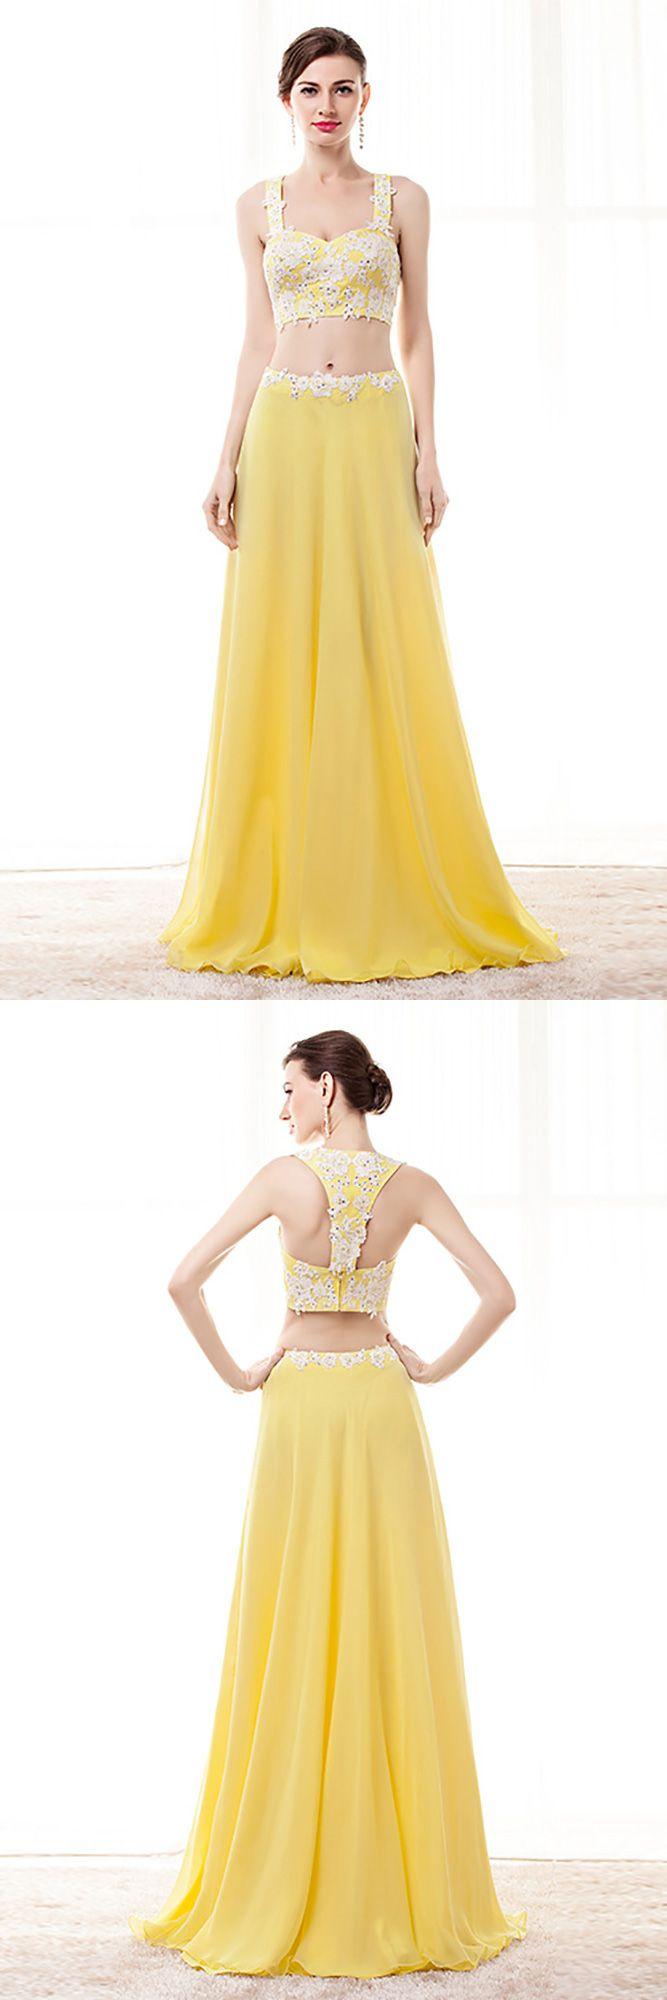 138 99 2 Piece Yellow Semi Formal Dress Crop Top With Lace Beading H76067 Gemgrace Com Crop Top Dress Formal Dresses Semi Formal Dress [ 2000 x 667 Pixel ]